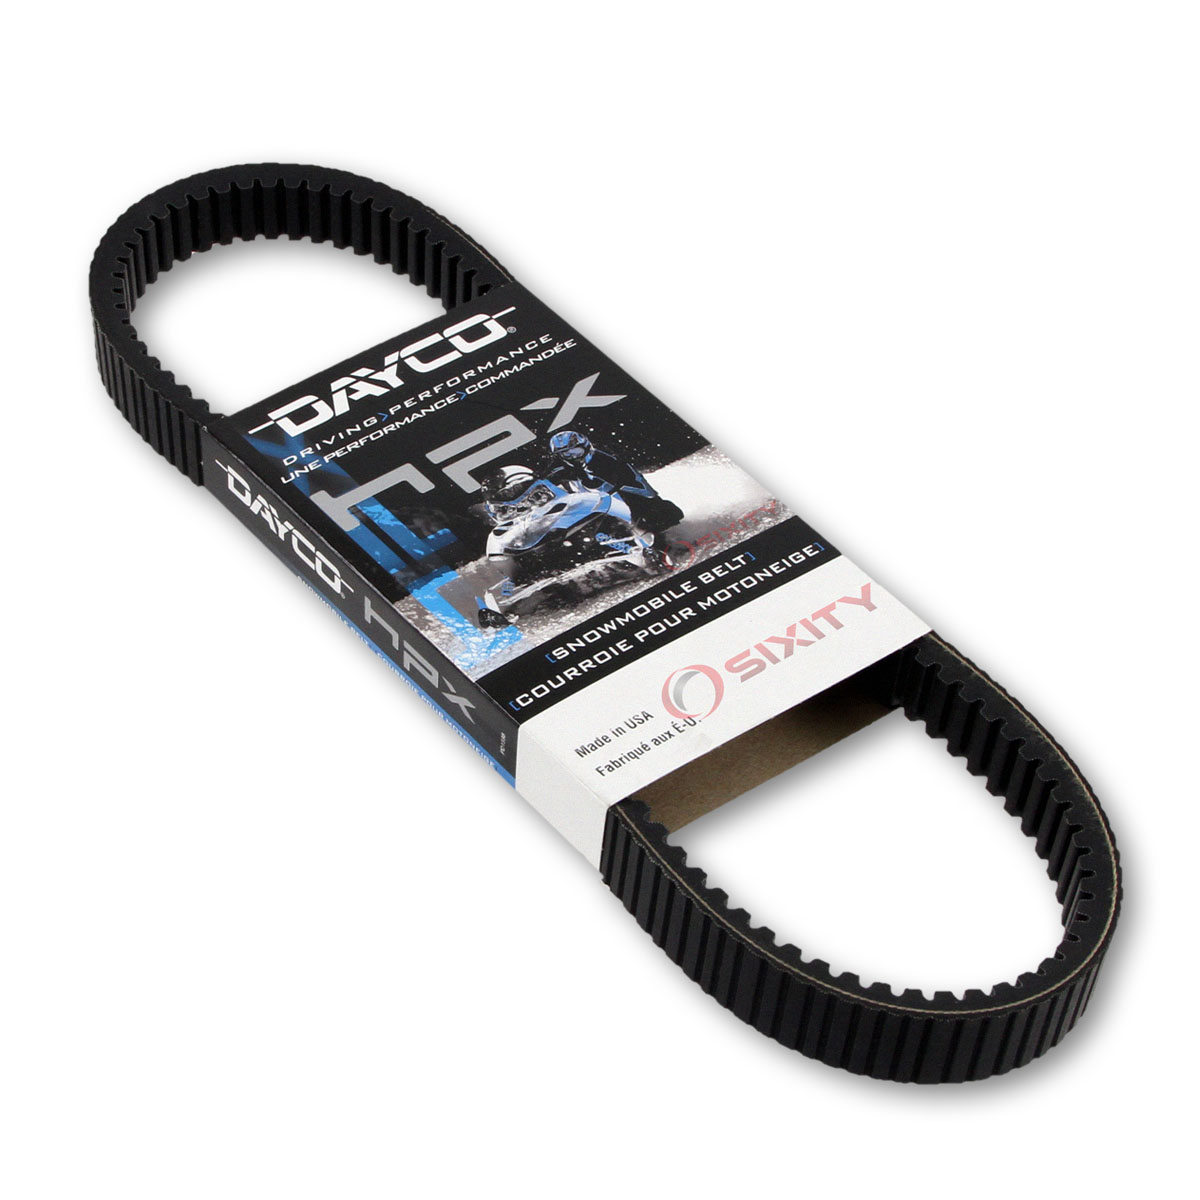 how to change the drive belt on a 450 yamaha